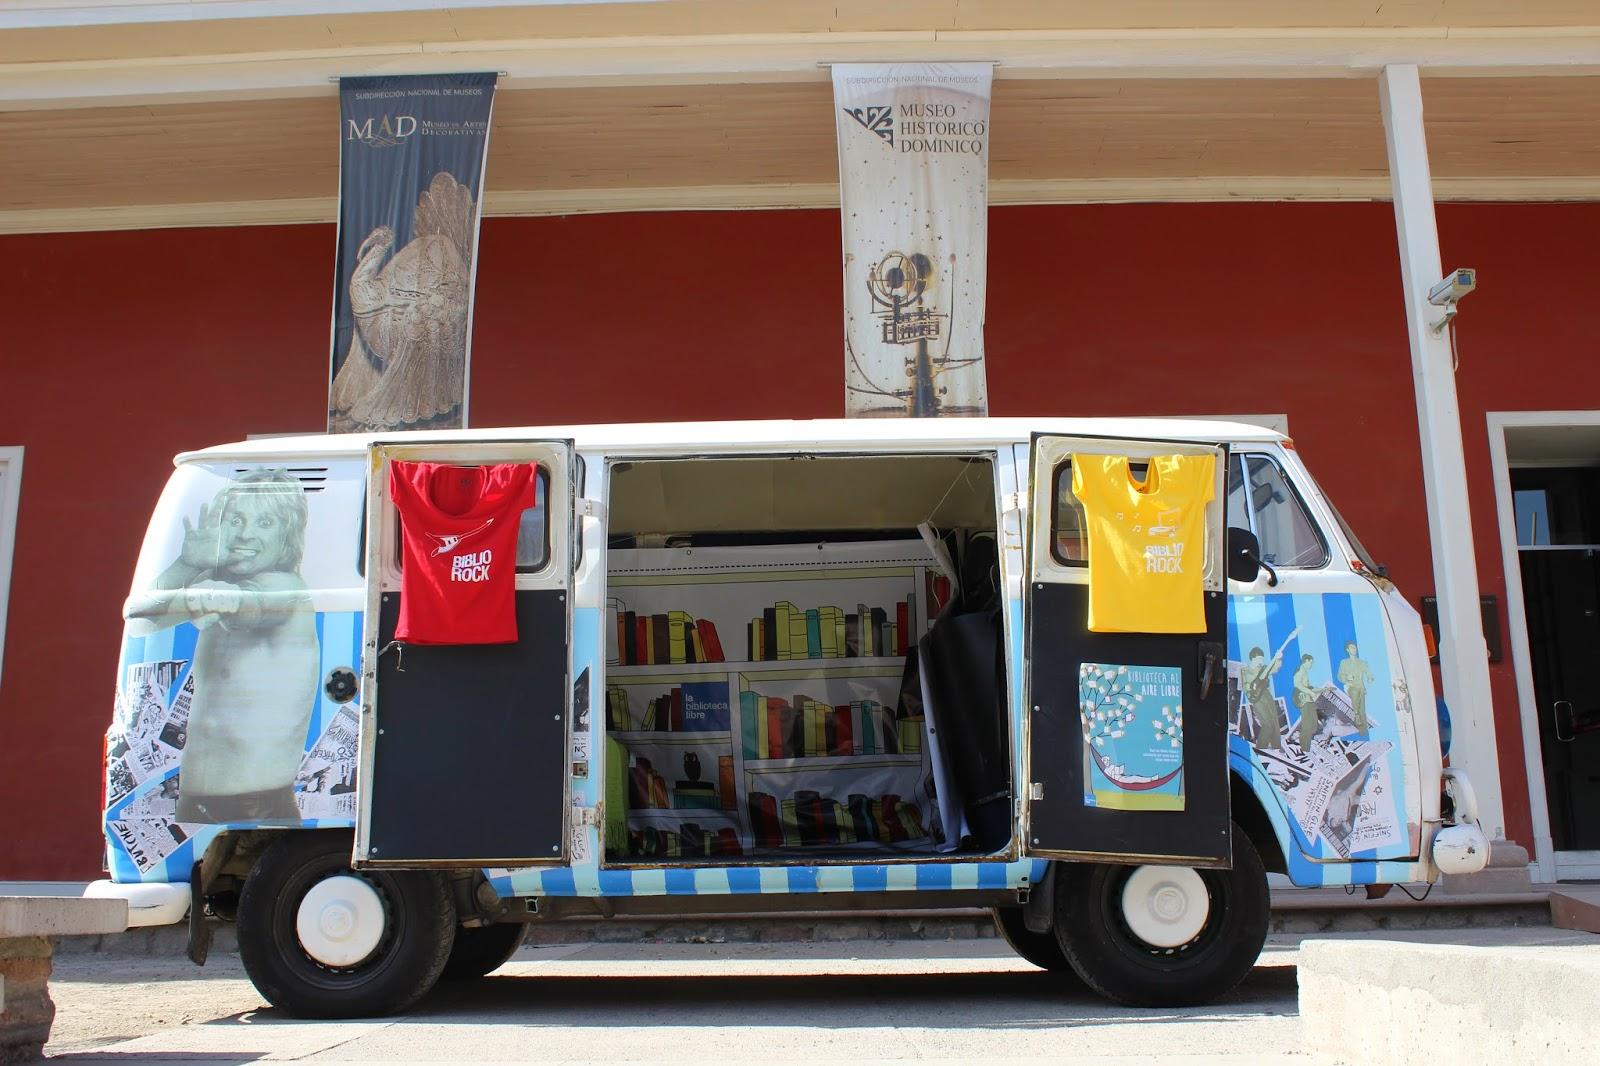 Biblioteca Patrimonial Recoleta Dominica (BPRD